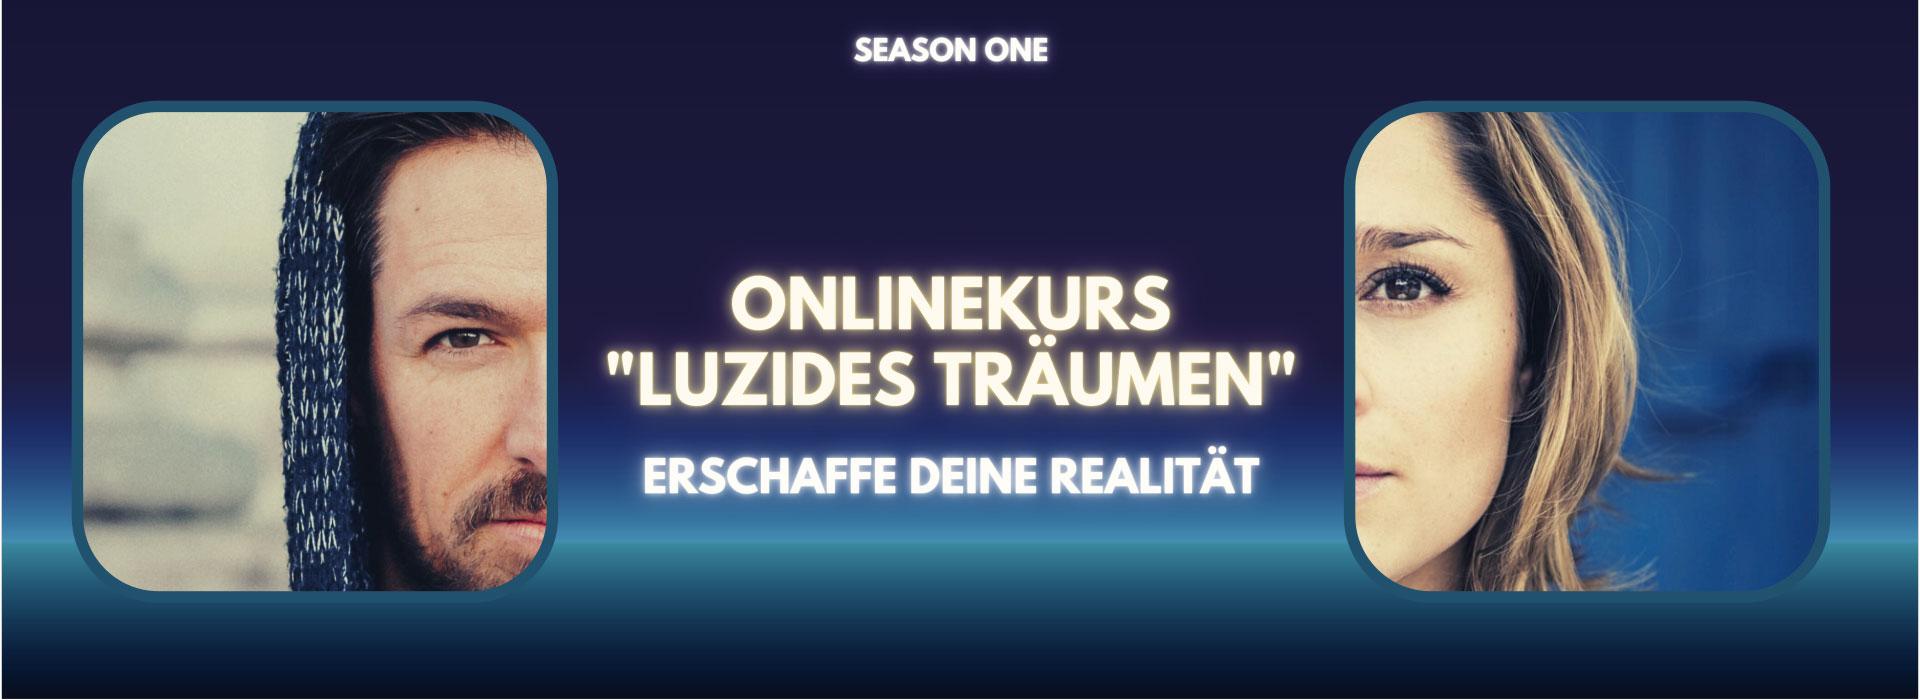 Onlinekurs Luzides Träumen - Season one